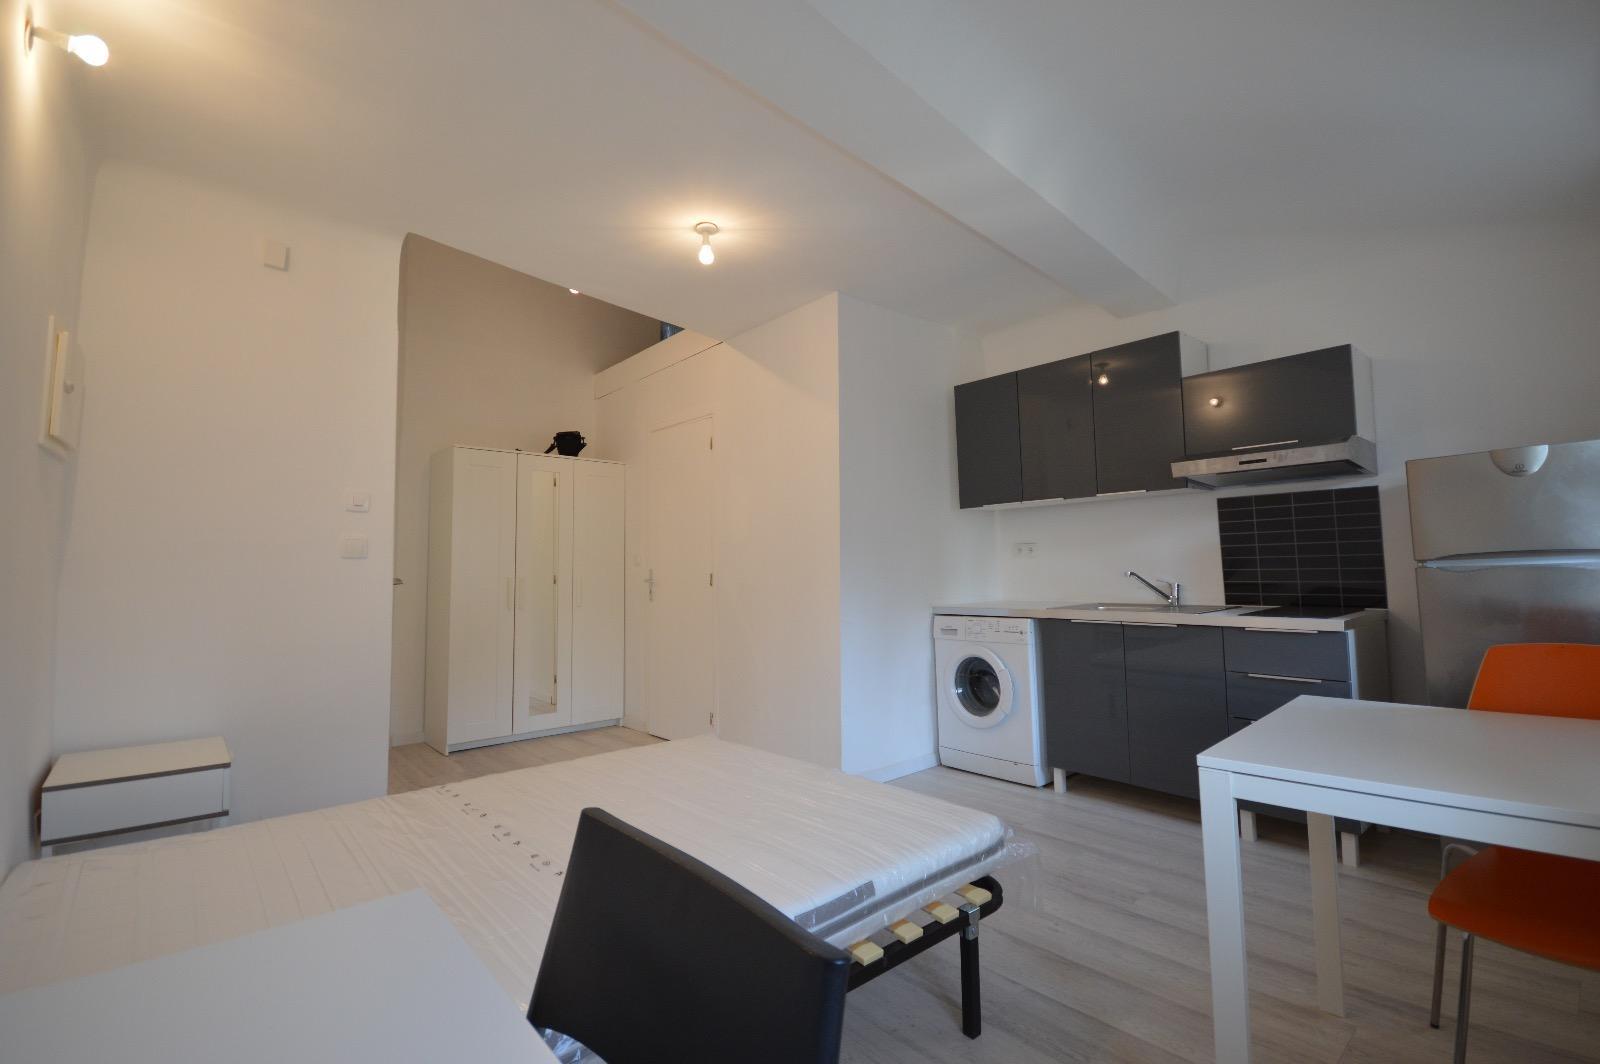 location studio 20 m2 centre ville. Black Bedroom Furniture Sets. Home Design Ideas